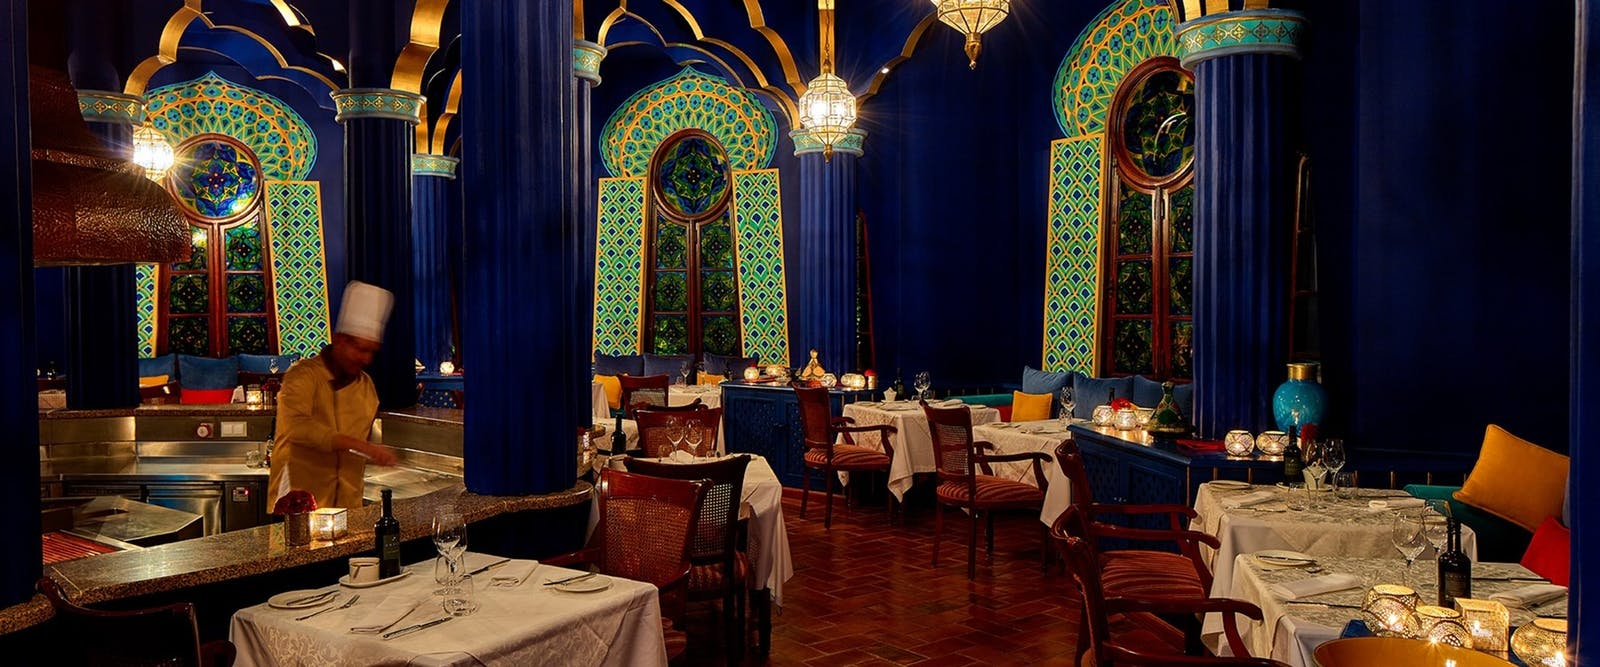 aladin_restaurant_vila_vita_parc